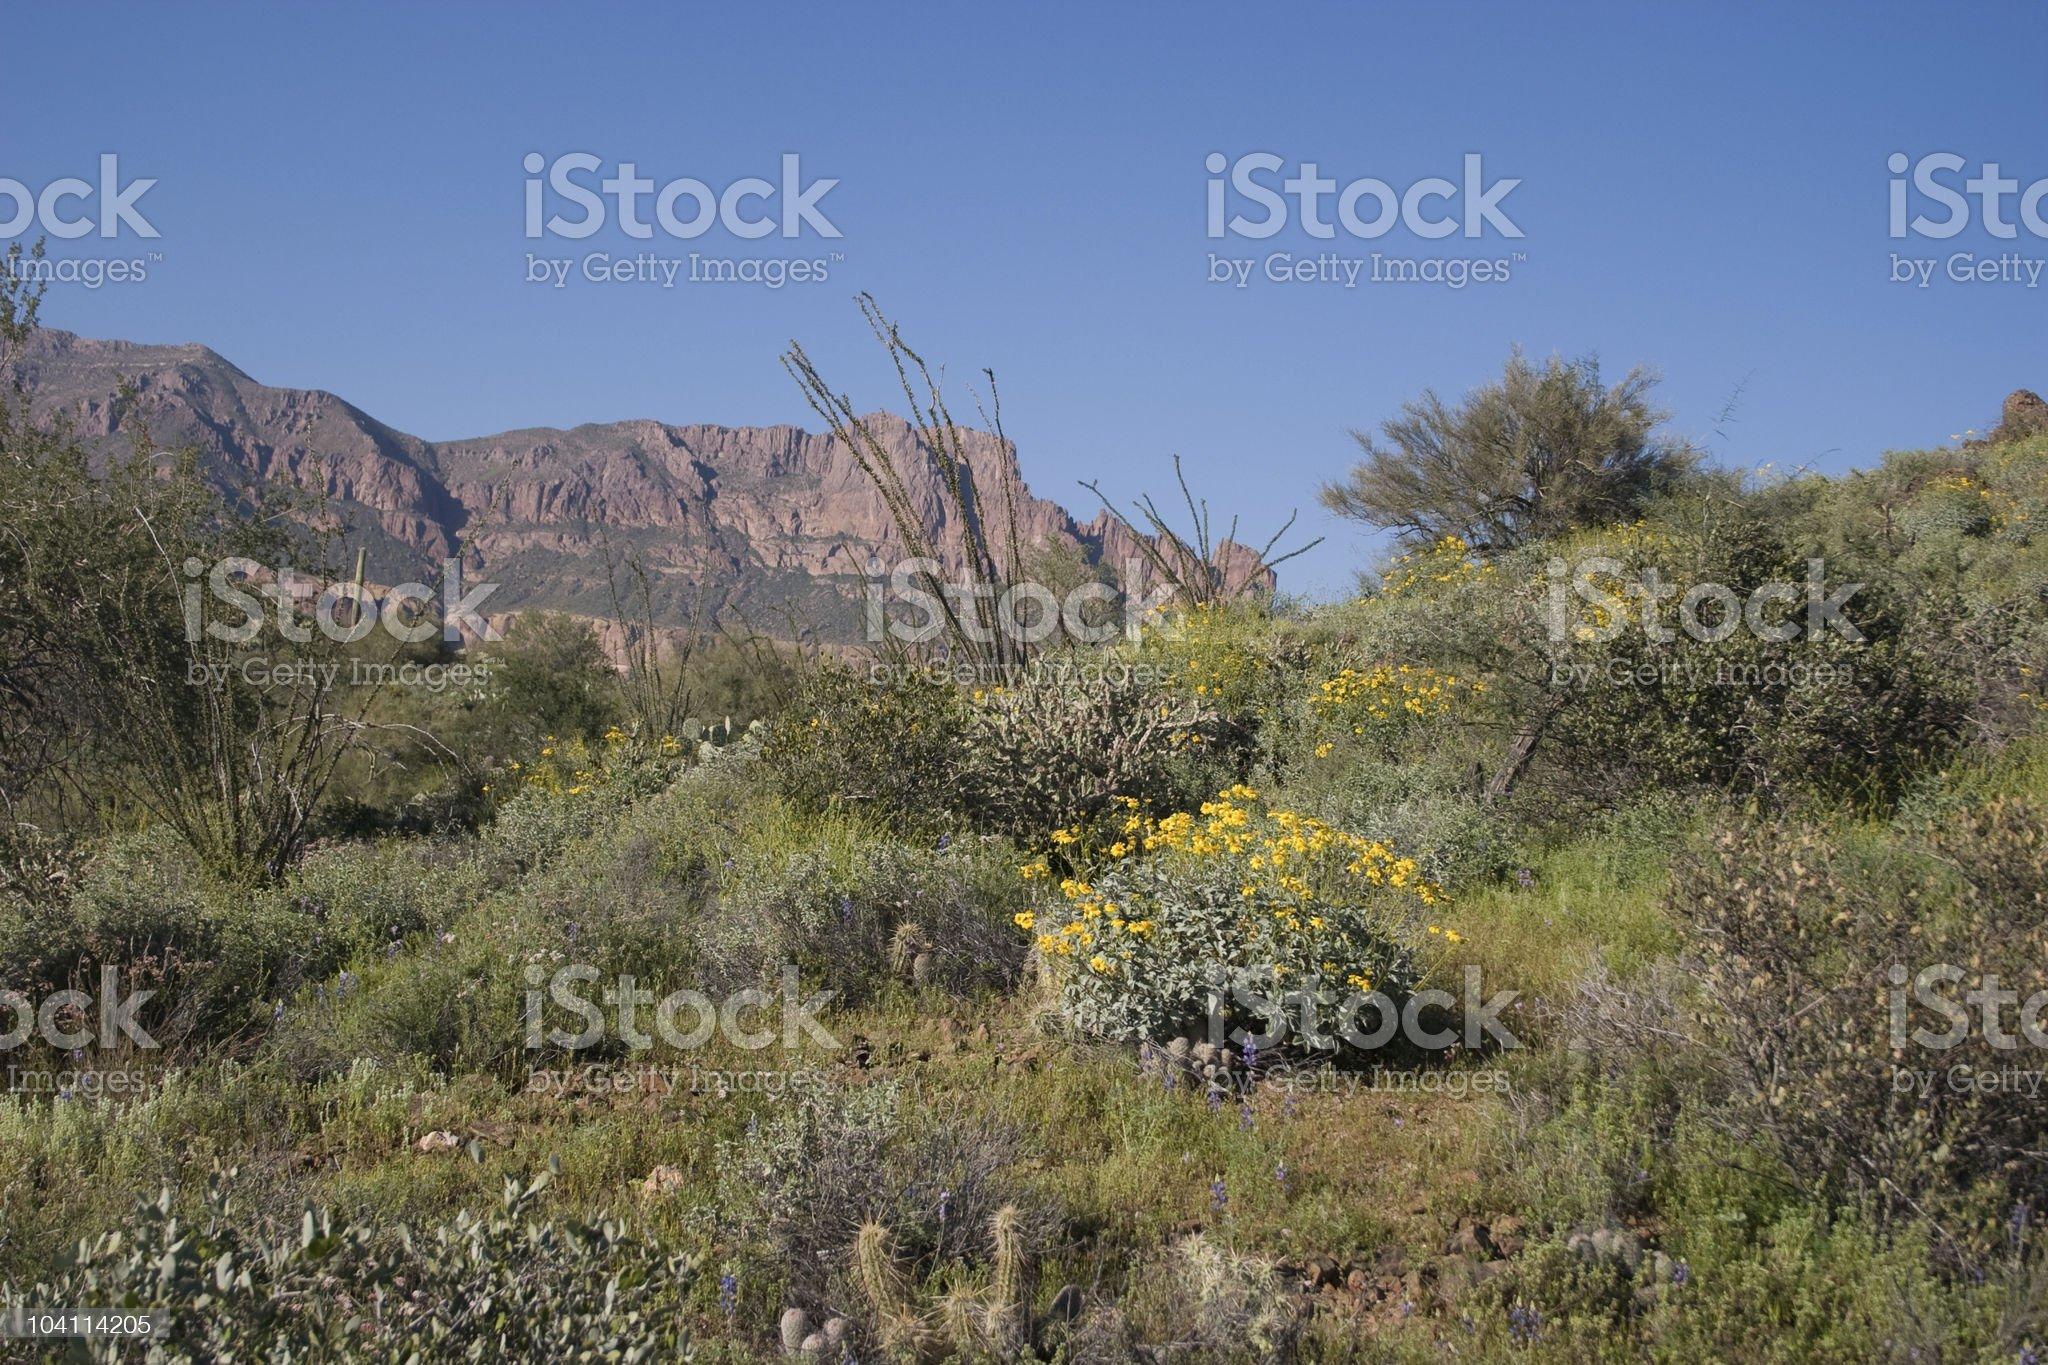 Cactus Variety royalty-free stock photo